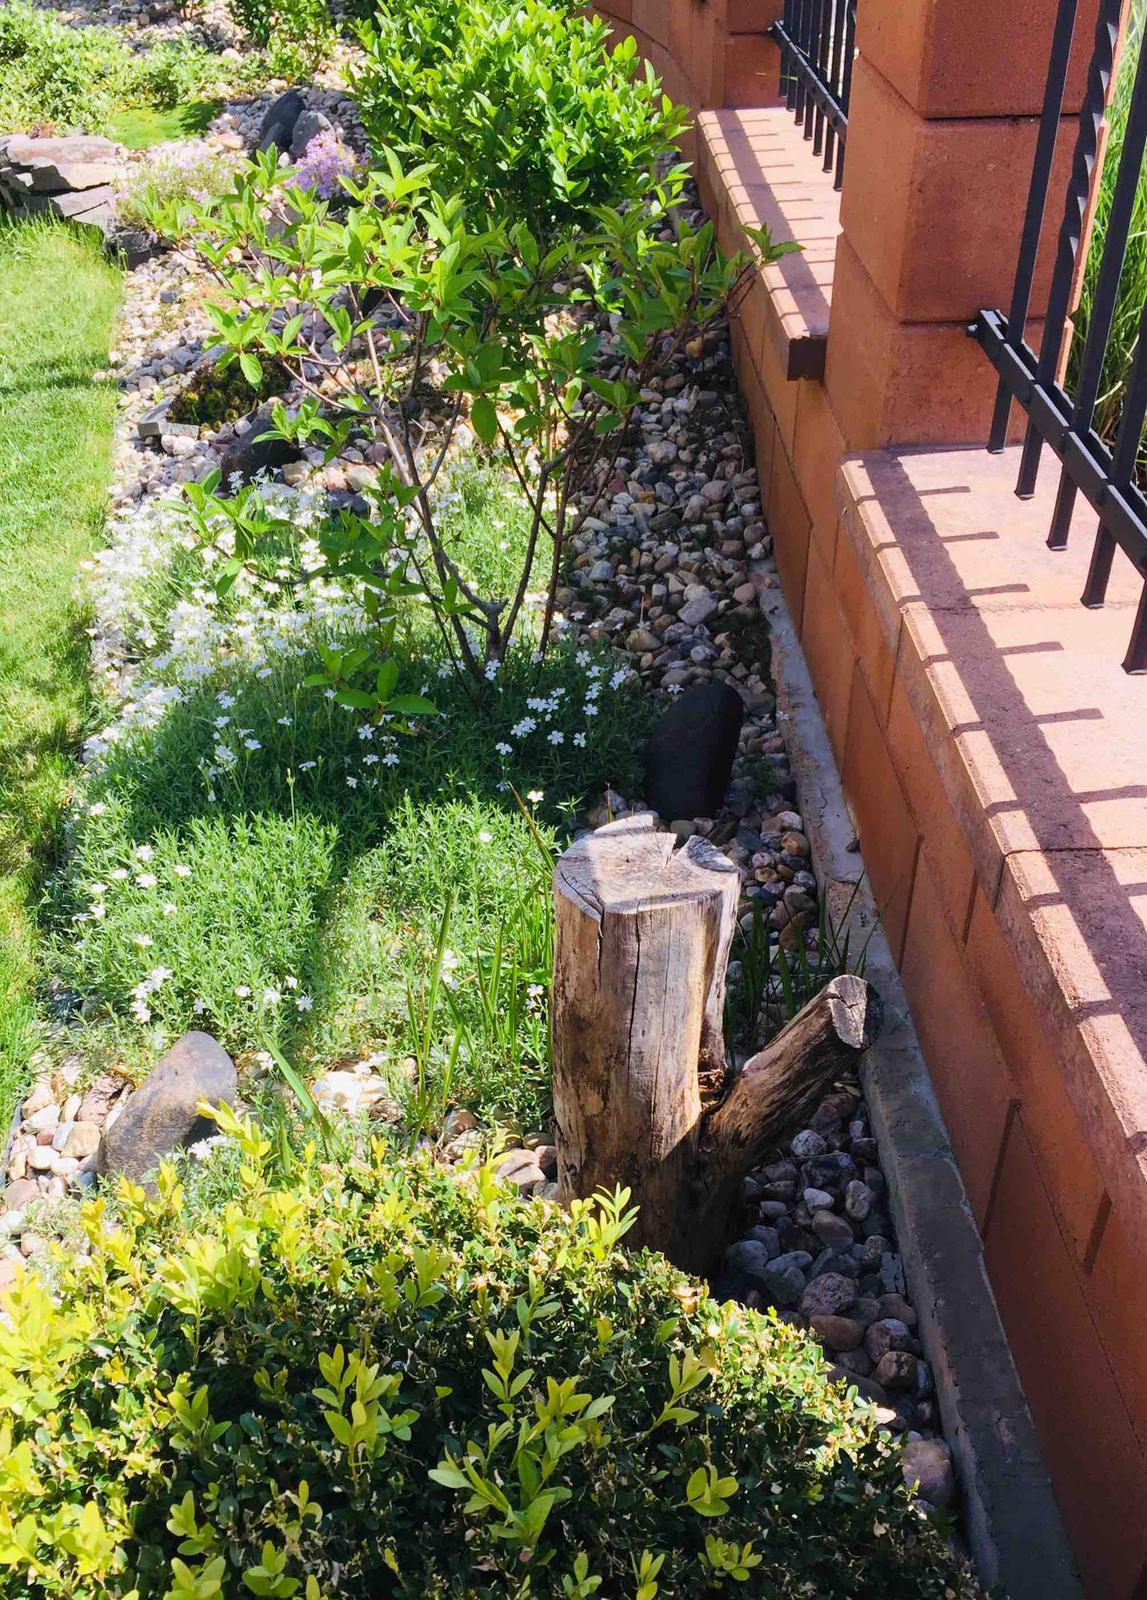 Naše barevná zahrada 🌸 rok 2020 - Po letech se to krásně rozrůstá 🤗